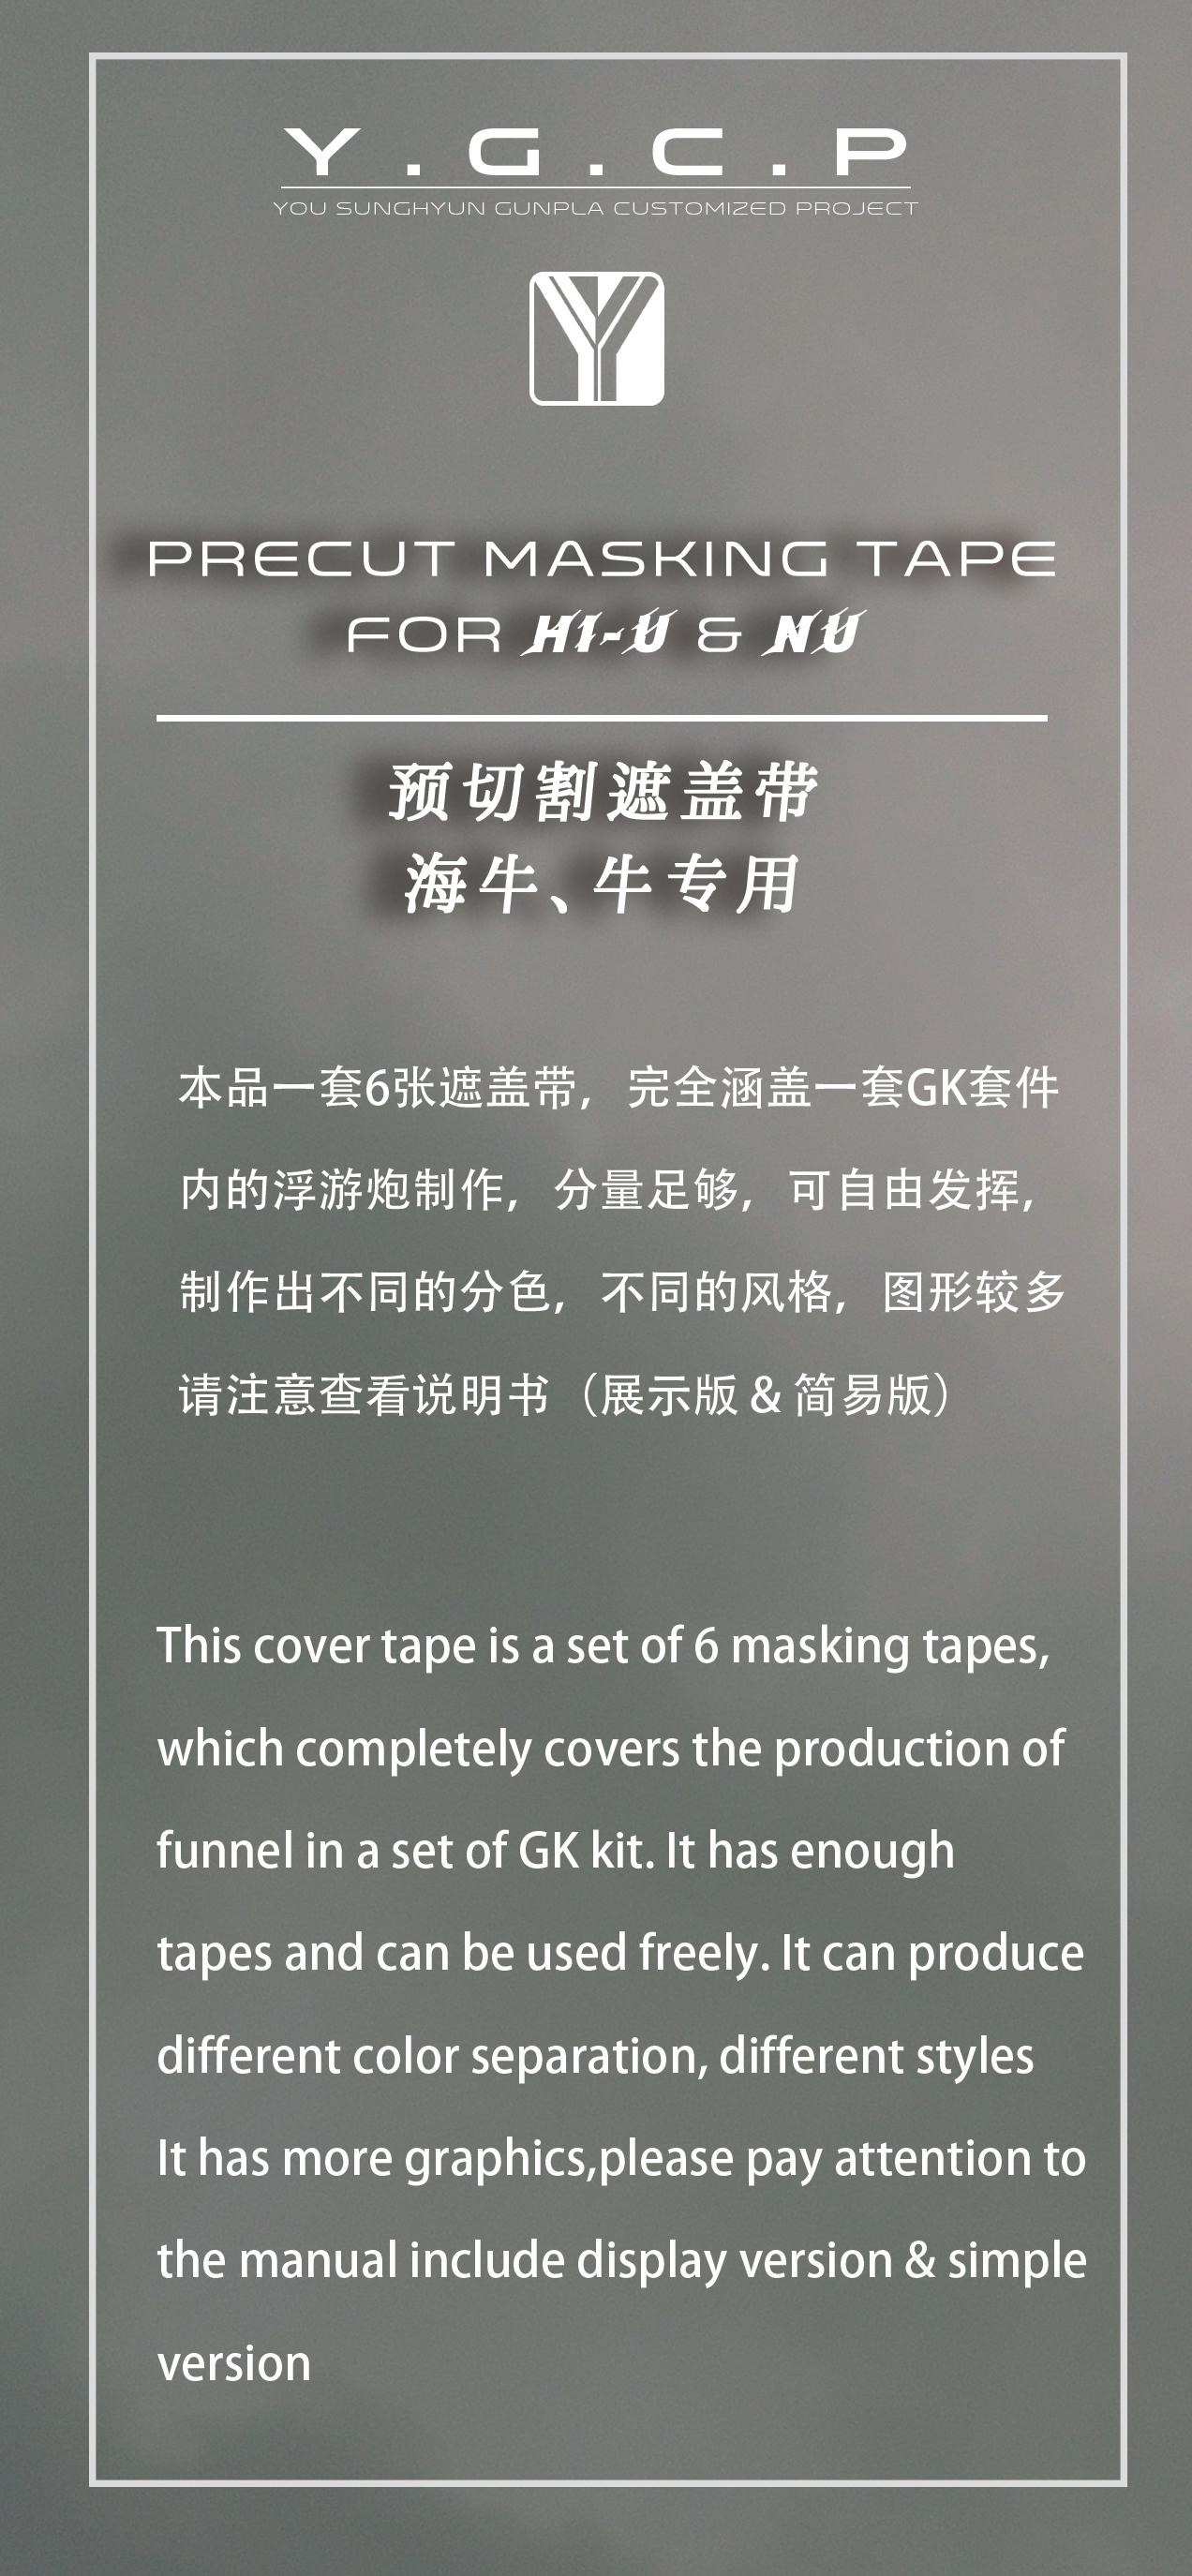 G825_YGCP_mg_yujiaoland_masking_tape_nu_003.jpg